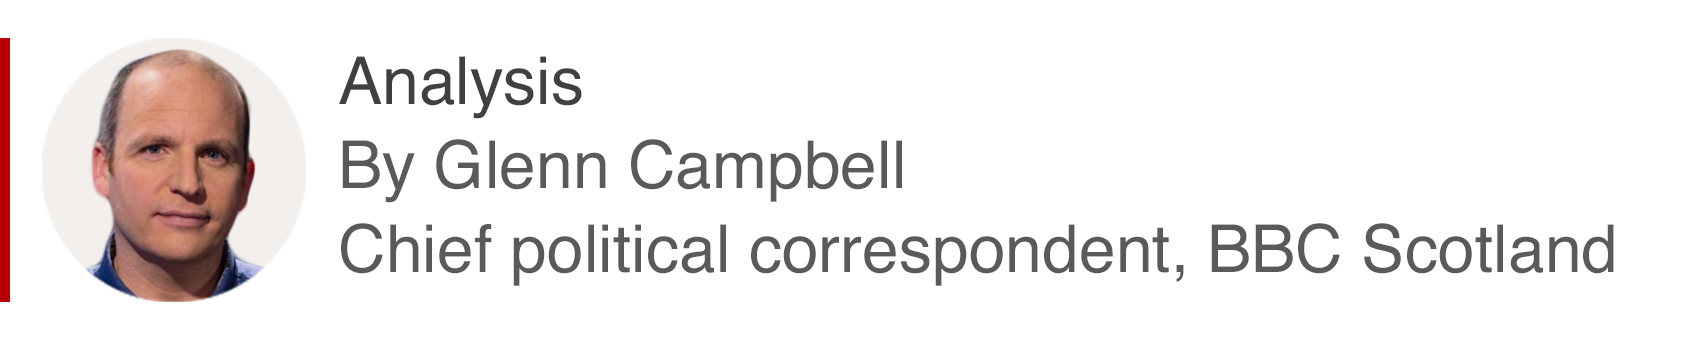 Analysis box by Glenn Campbell, Chief political correspondent, BBC Scotland